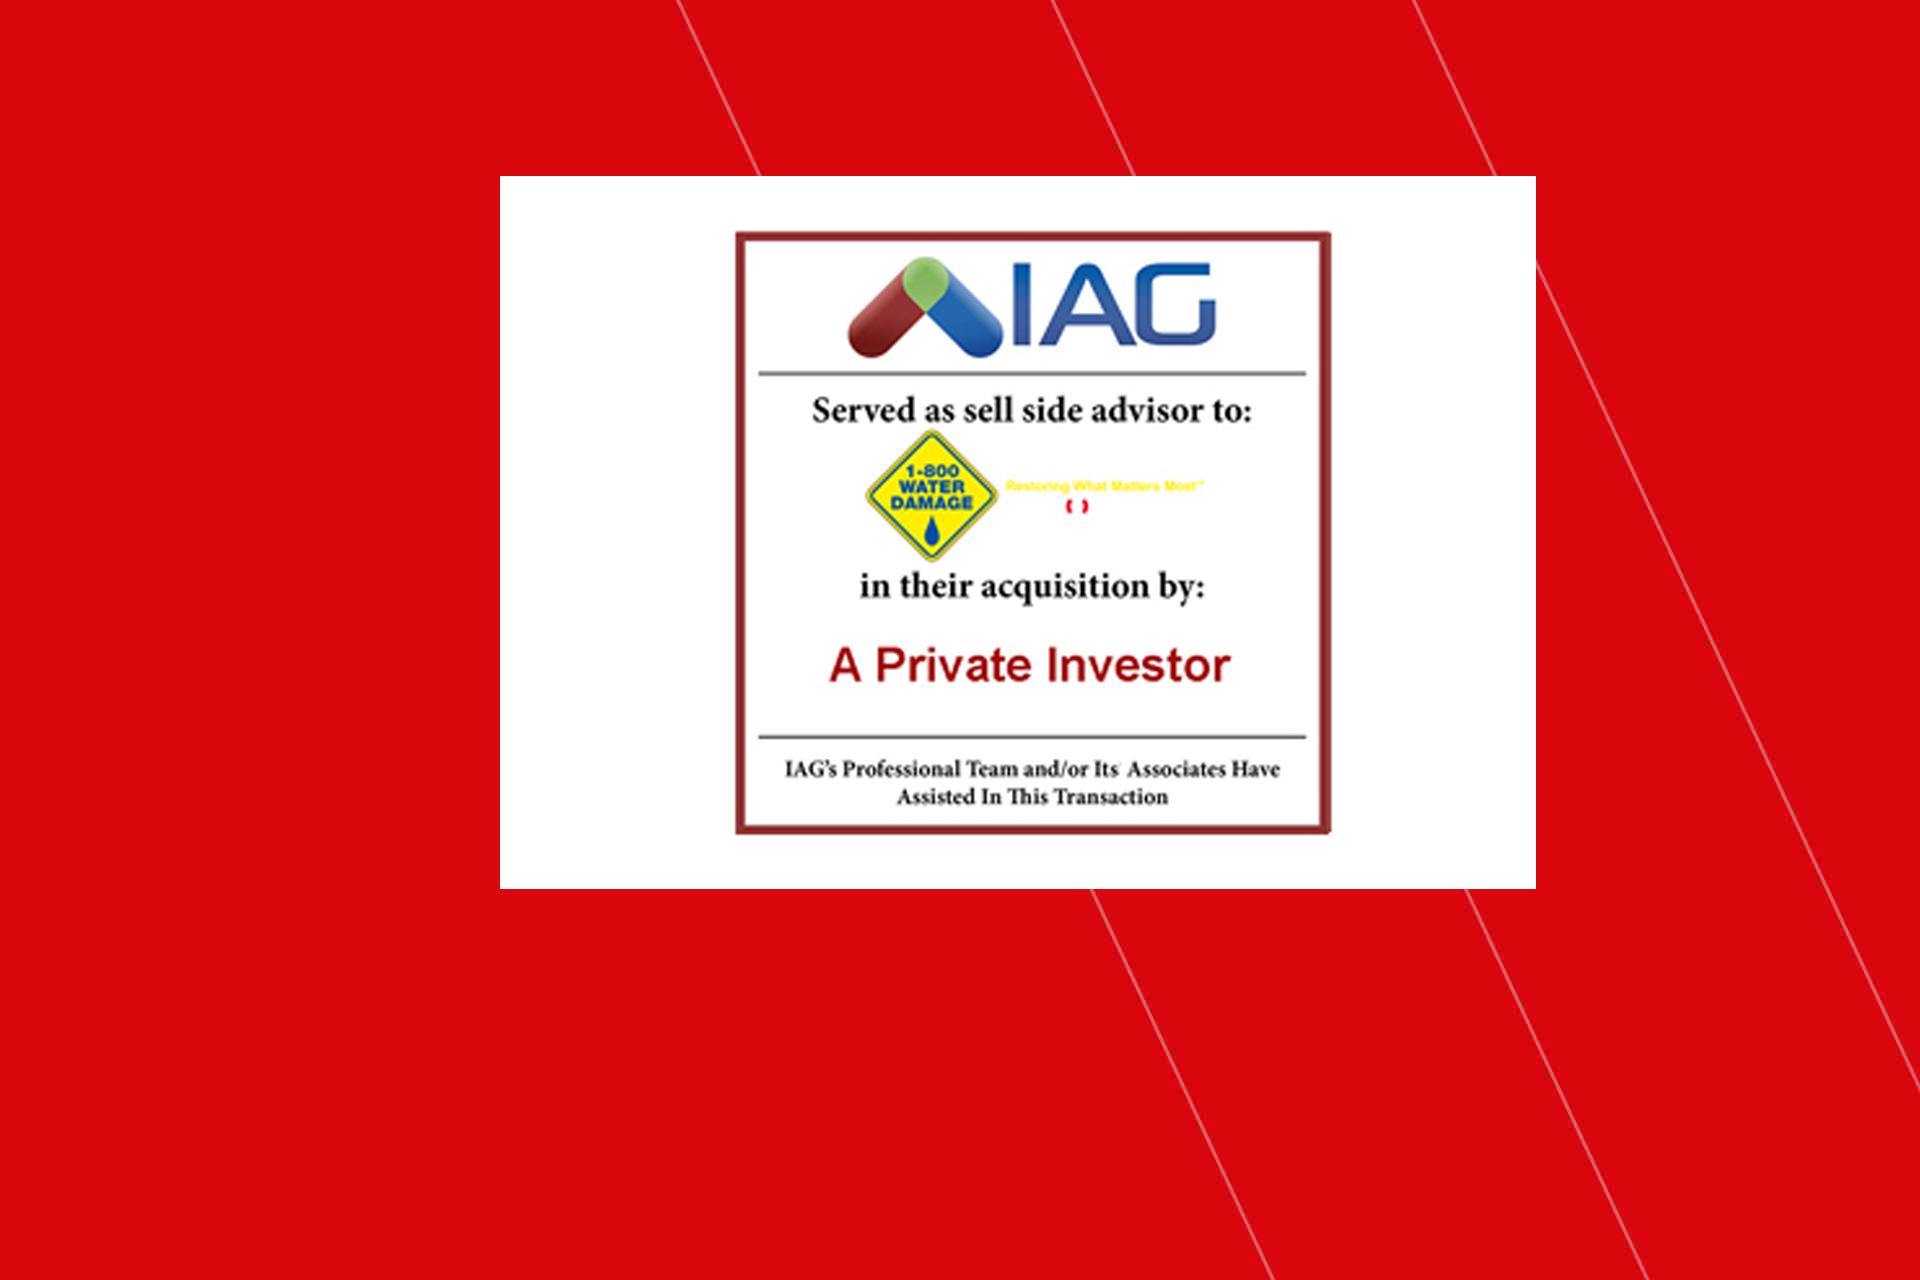 iag sells 1800 water damage